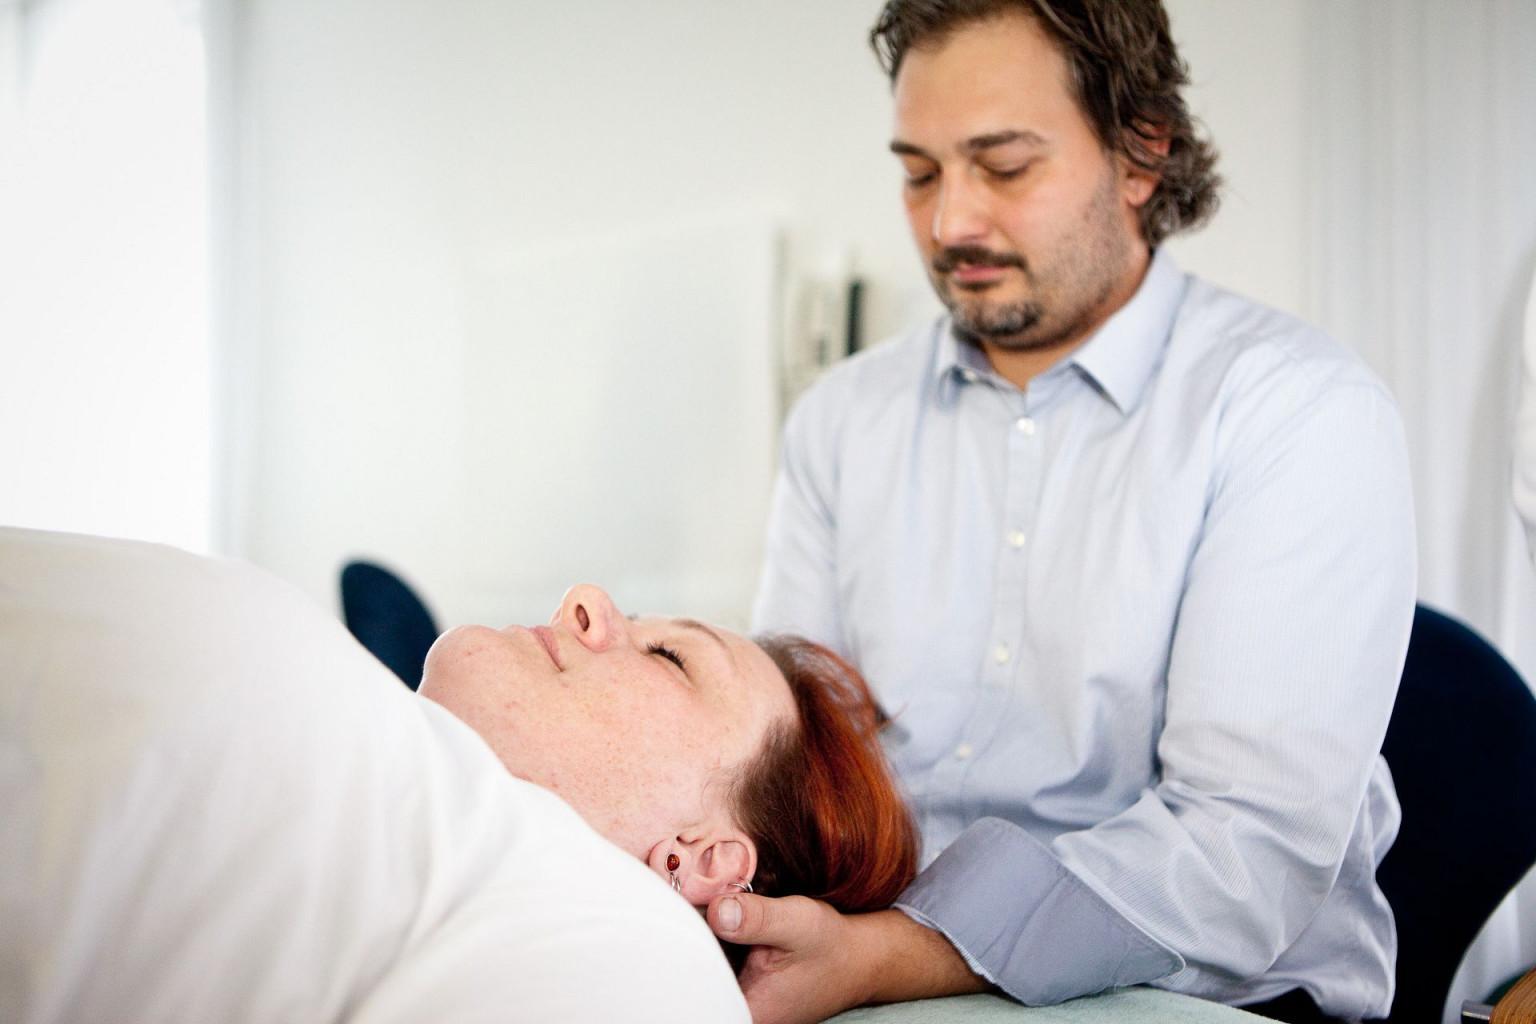 Cranio sacrale Behandlung